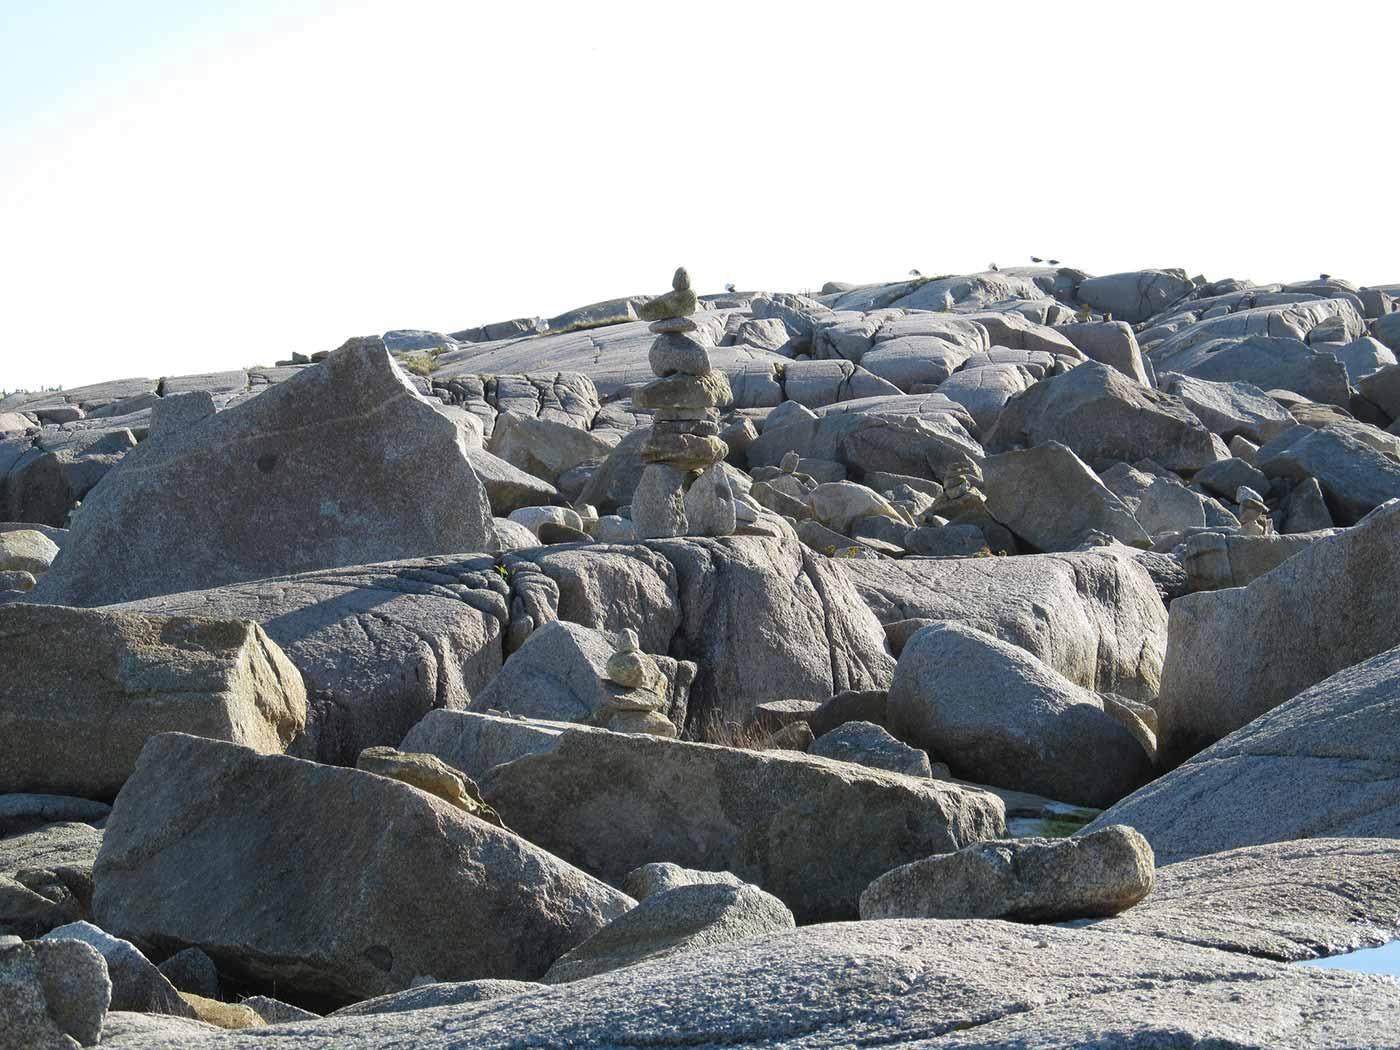 Cairn on rocks.